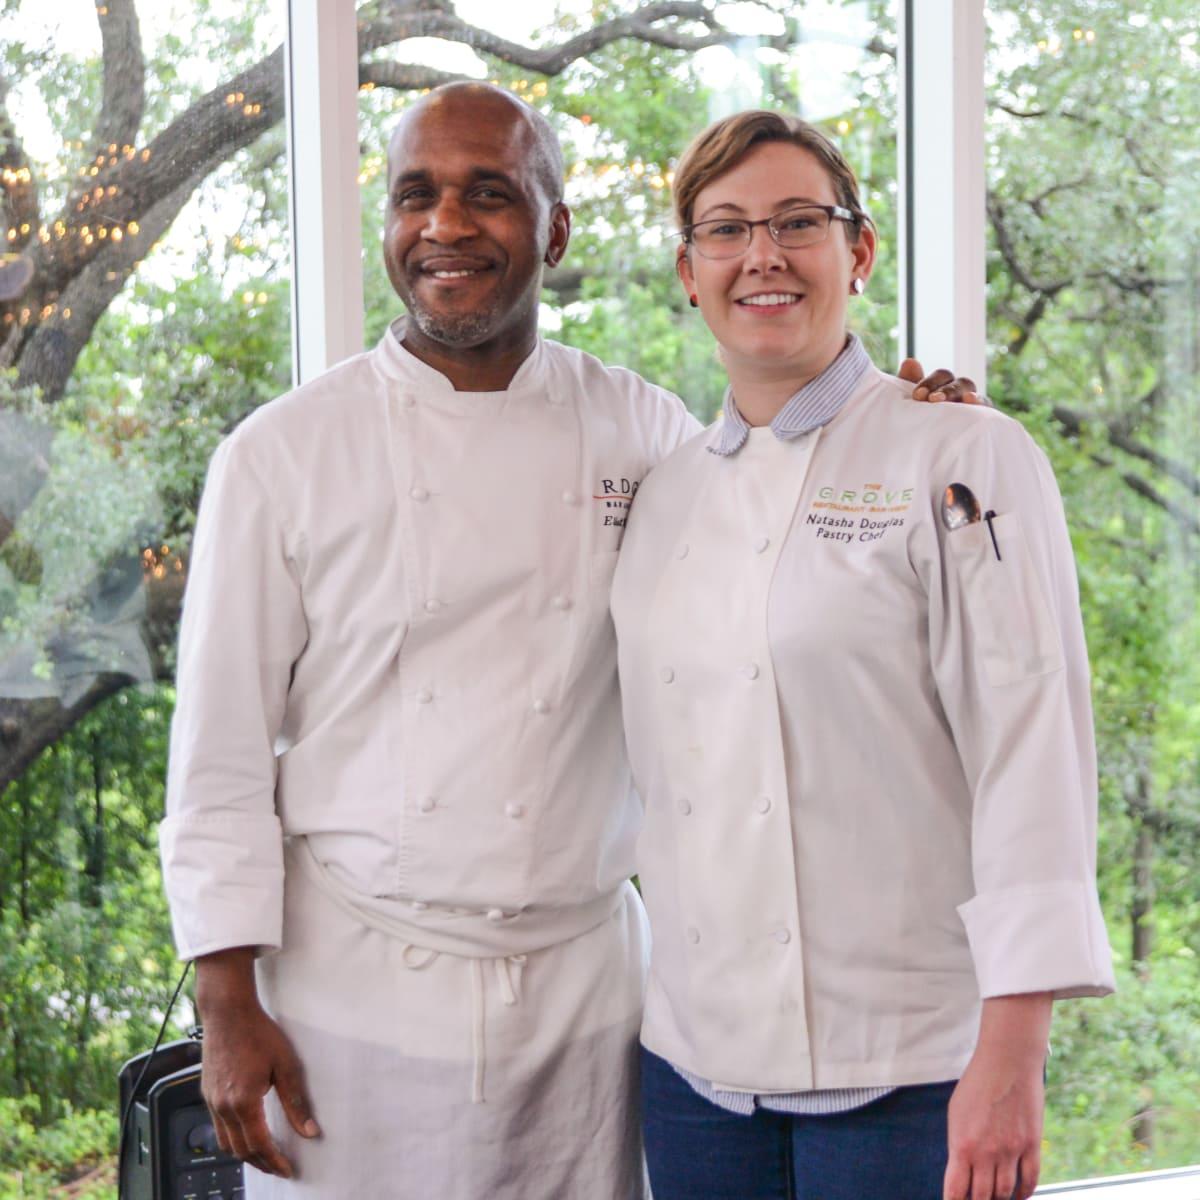 Recipe for Success 10th anny dinner, 5/16 Elliott Kelly, Naasha Douglas